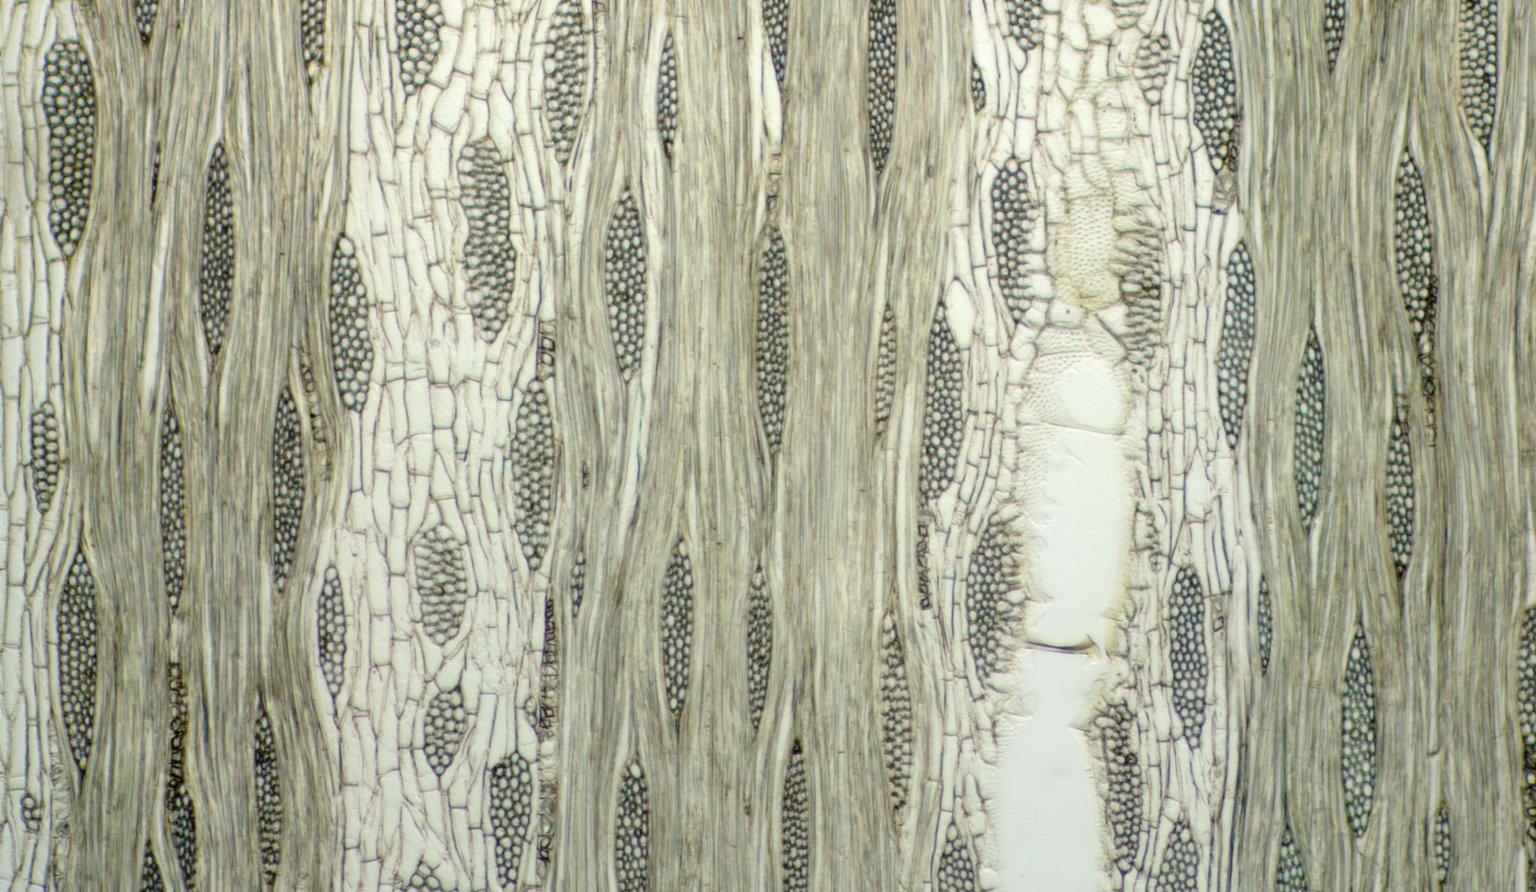 LEGUMINOSAE CAESALPINIOIDEAE Mimosoid Clade Albizia zygia